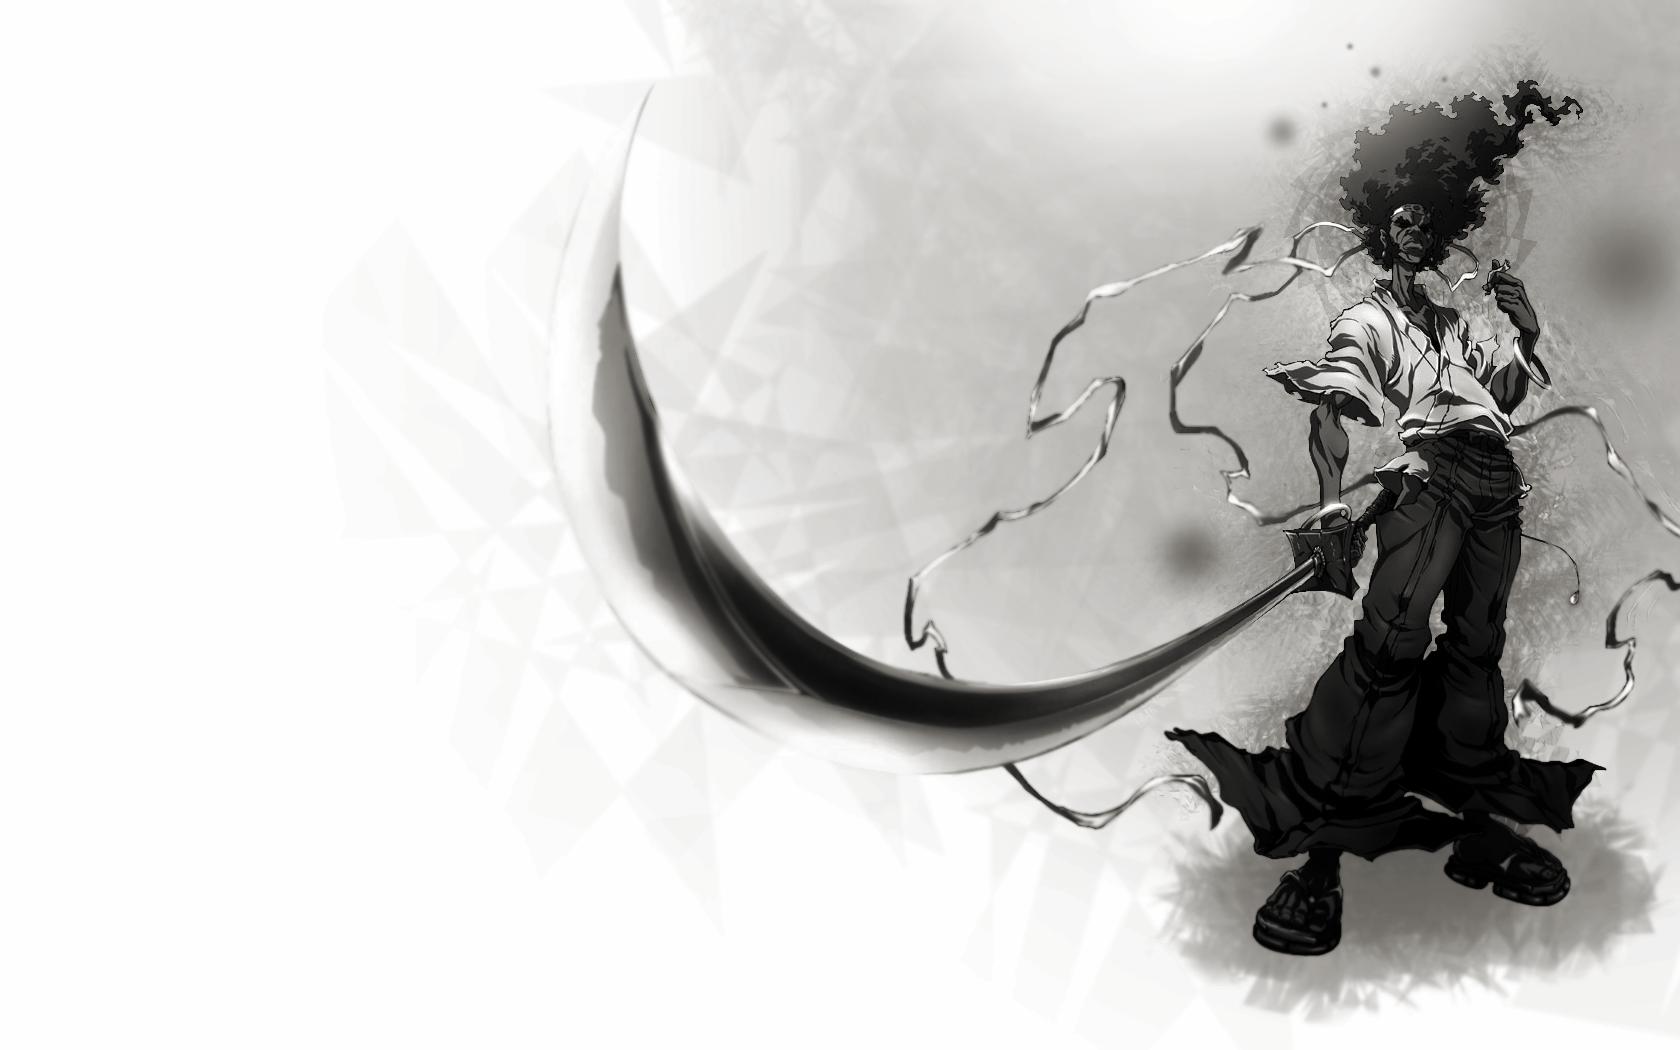 Afro Samurai Anime Game W Wallpaper 1680x1050 91897 Wallpaperup